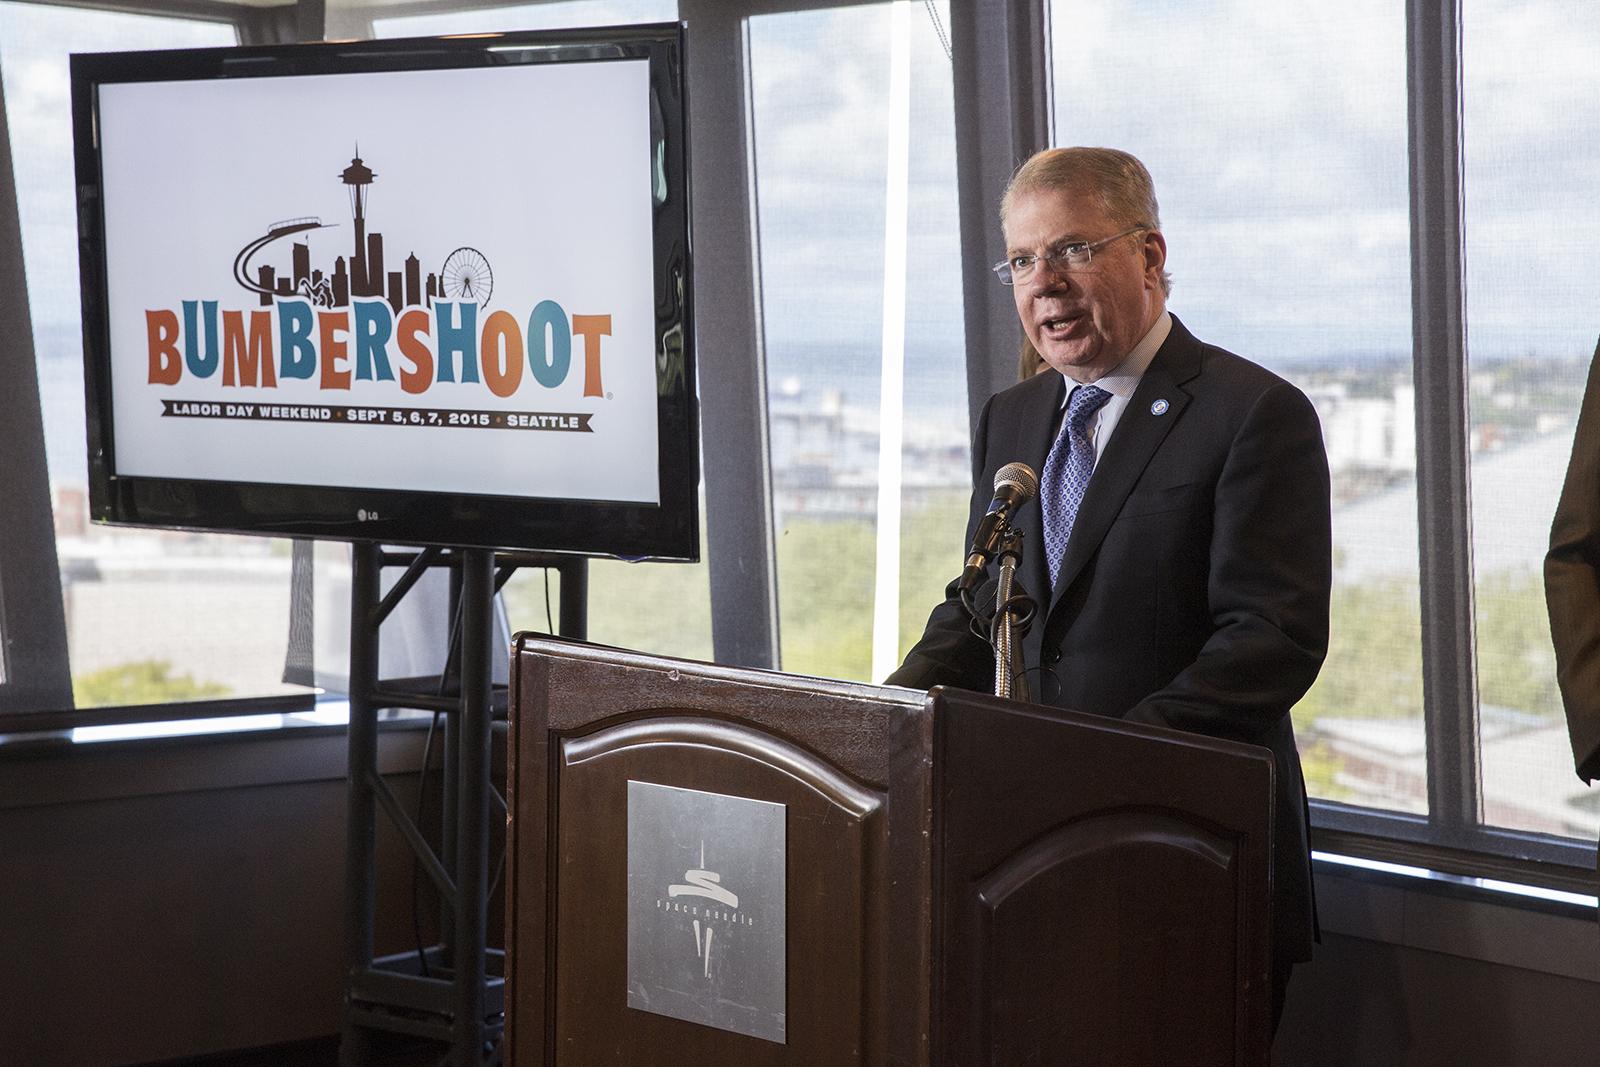 Mayor Ed Murray Bumbershoot 2015 Announcement  Photo by Alex Crick